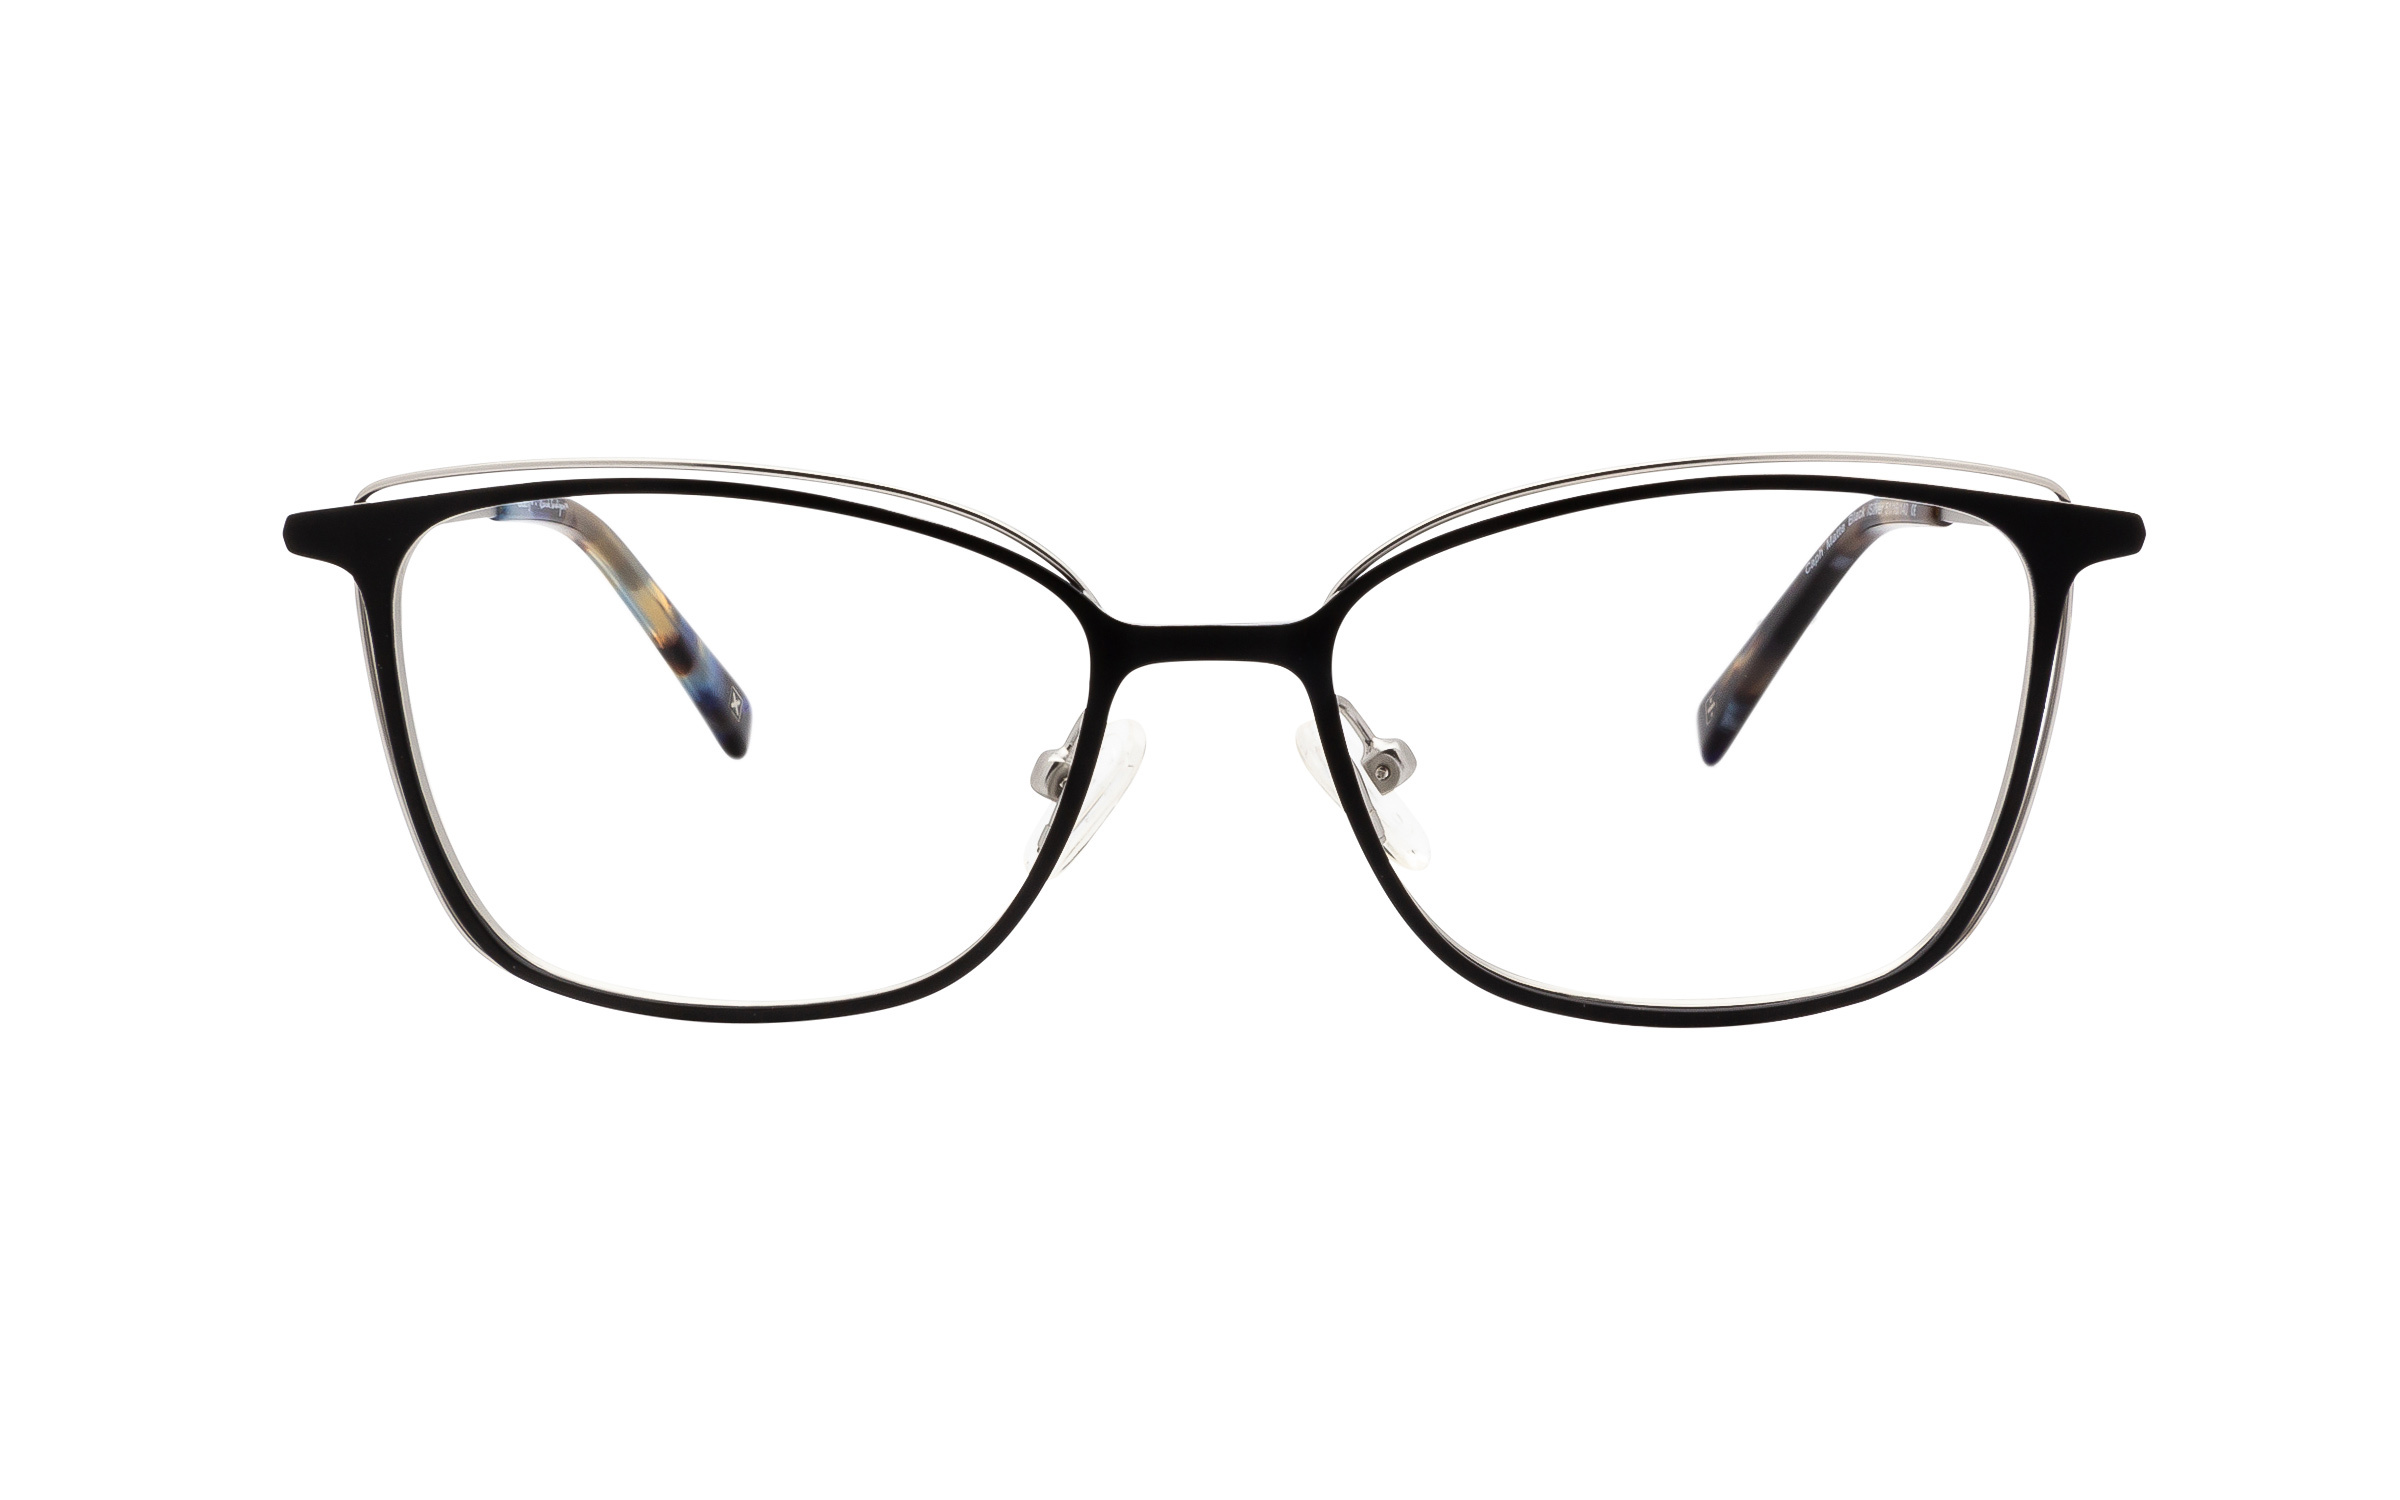 http://www.coastal.com/ - Derek Cardigan Caph DC218 C02 (51) Eyeglasses and Frame in Matte Satin Silver/Black | Metal – Online Coastal